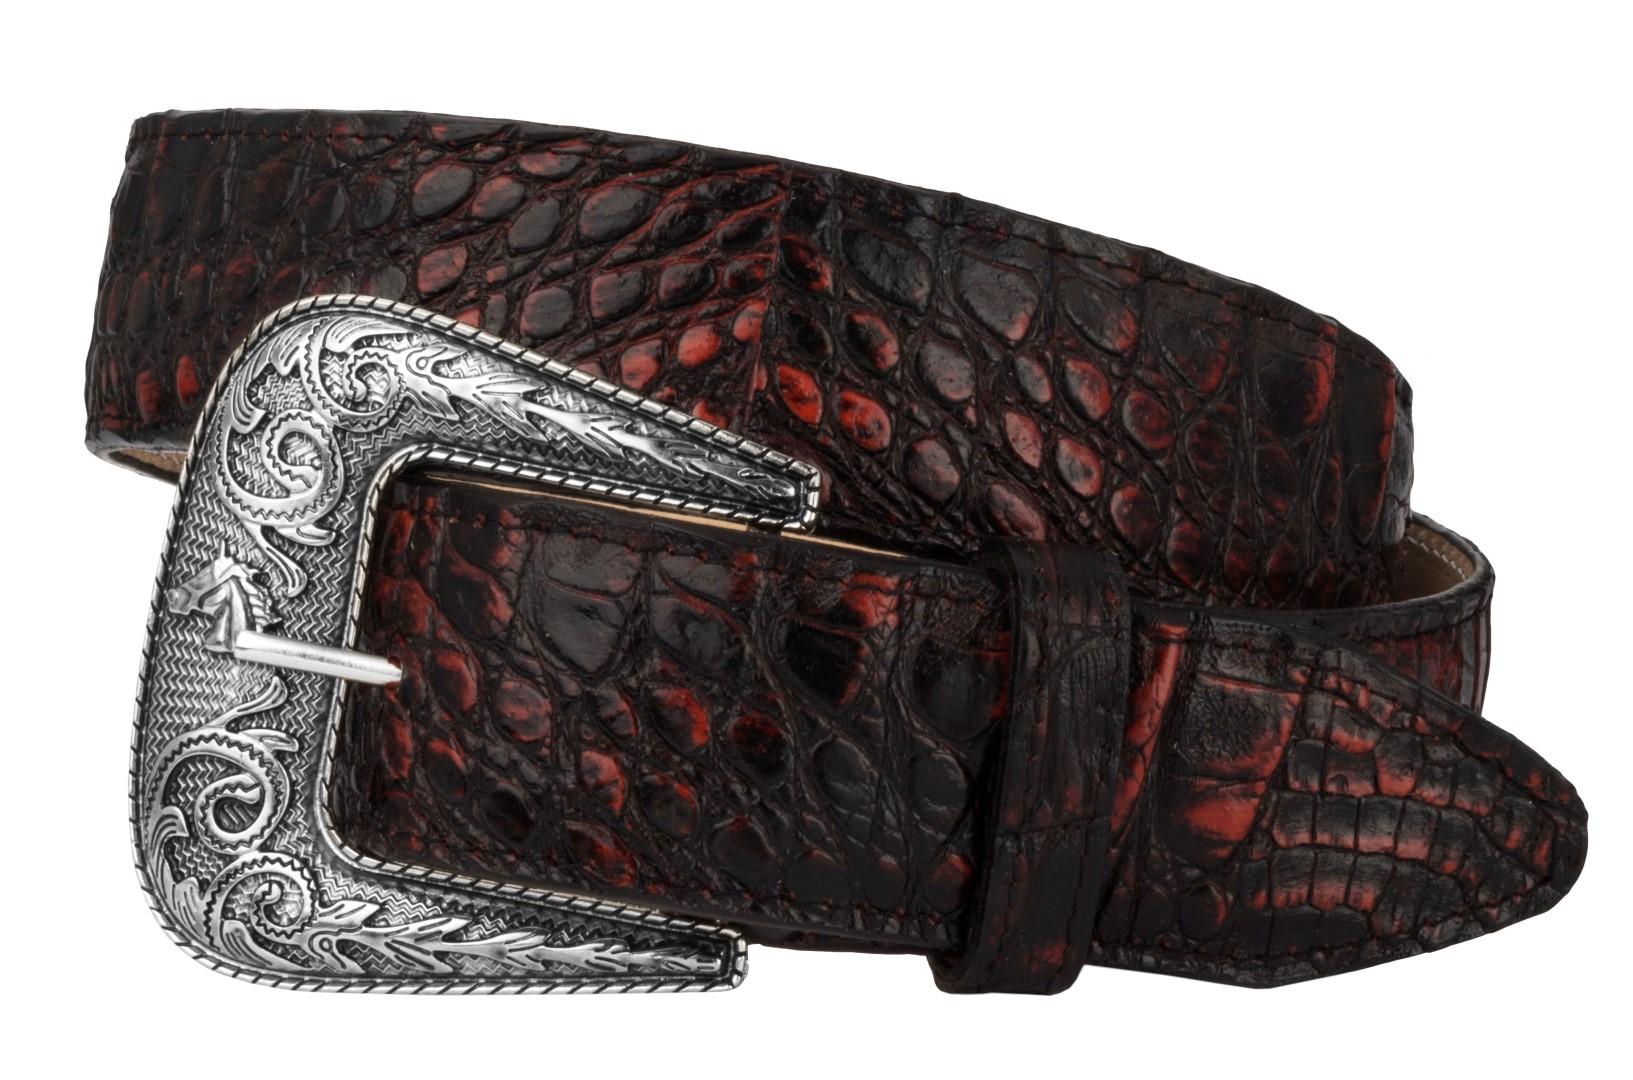 Mens Crocodile Alligator Pattern Leather Western Dress Cowboy Belt Black Cherry